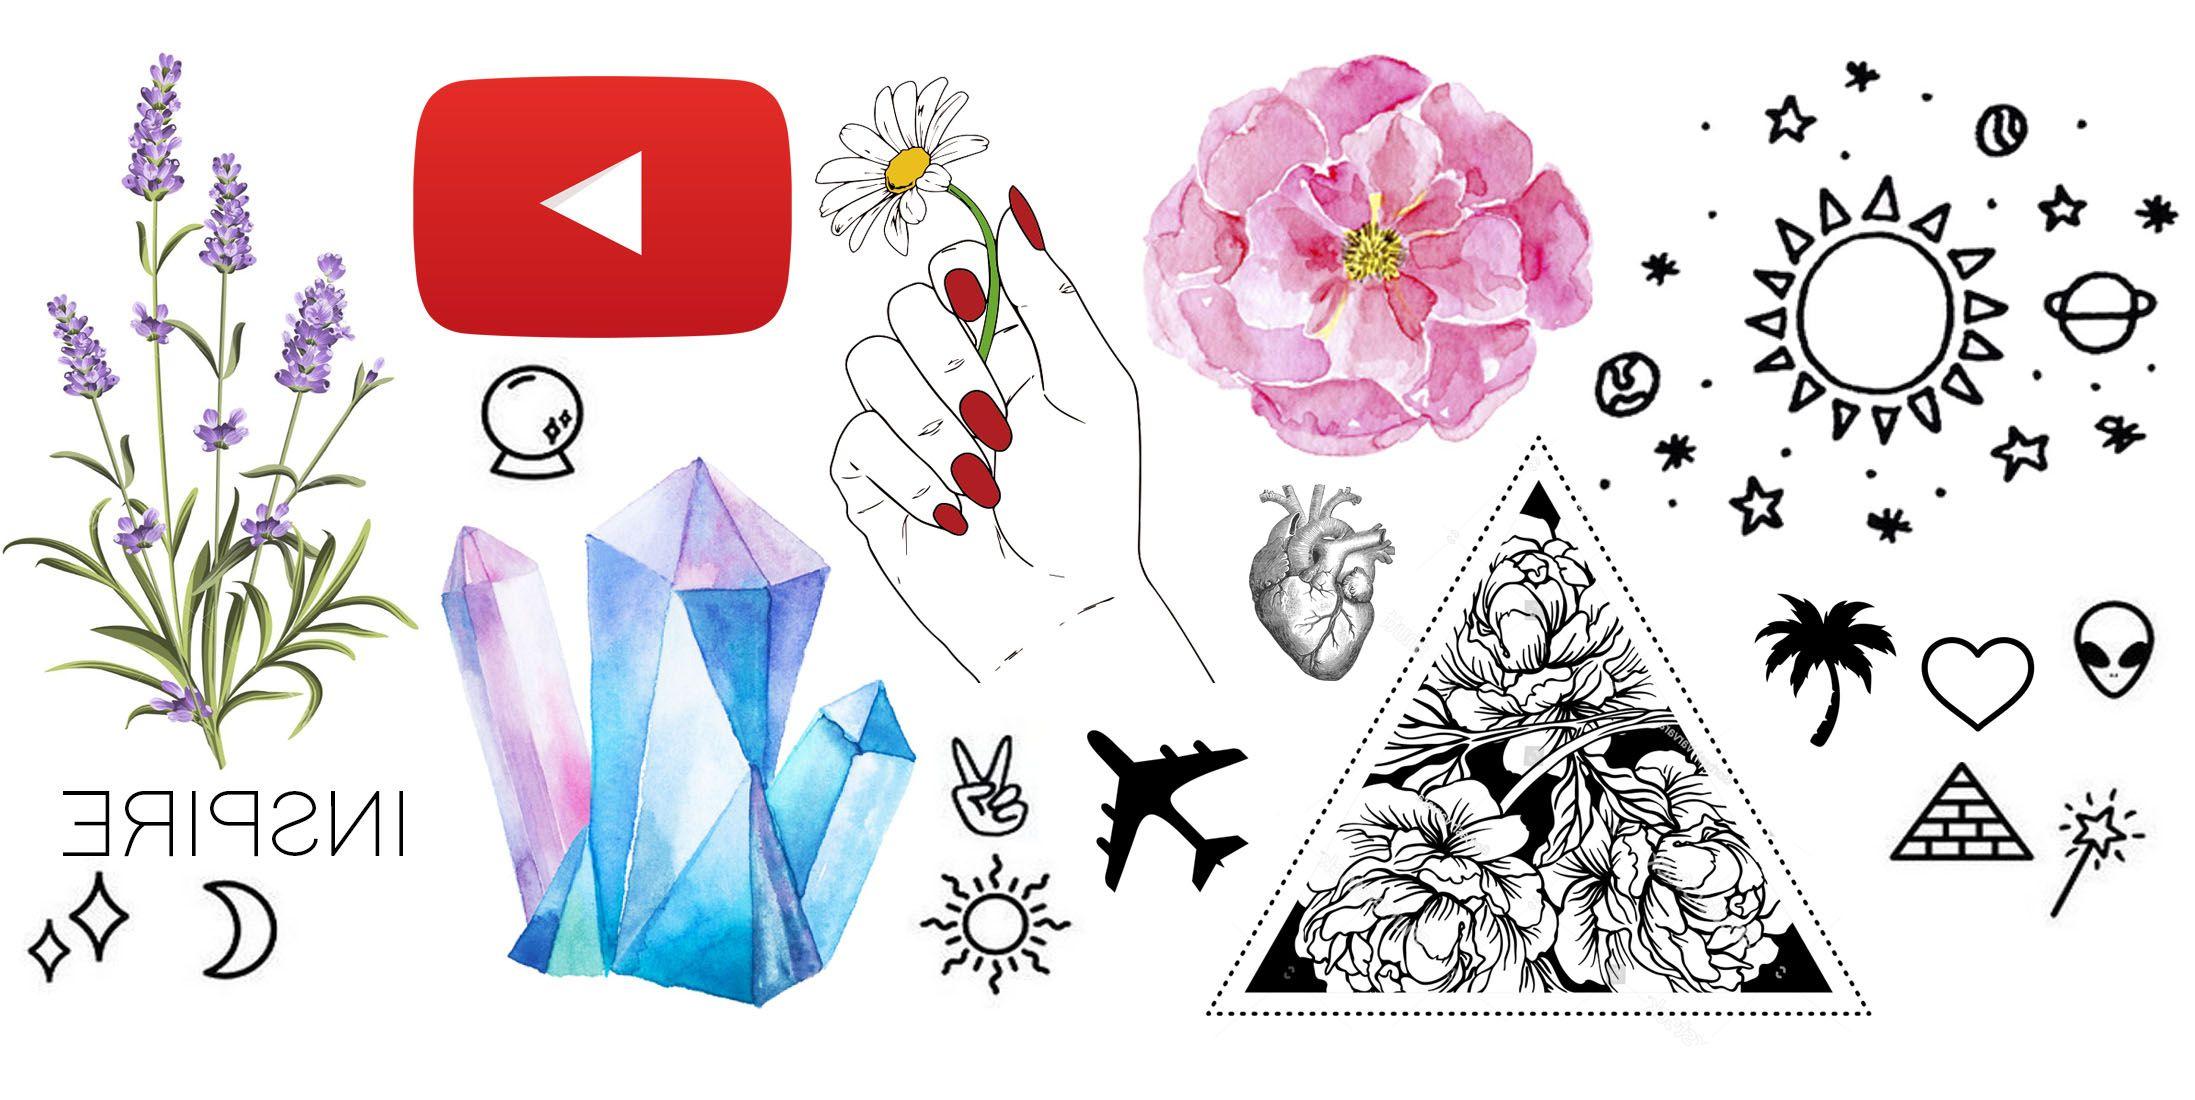 Hermosos Tatuajes Wallpapers Plantillas De Tatuajes Tatuajes